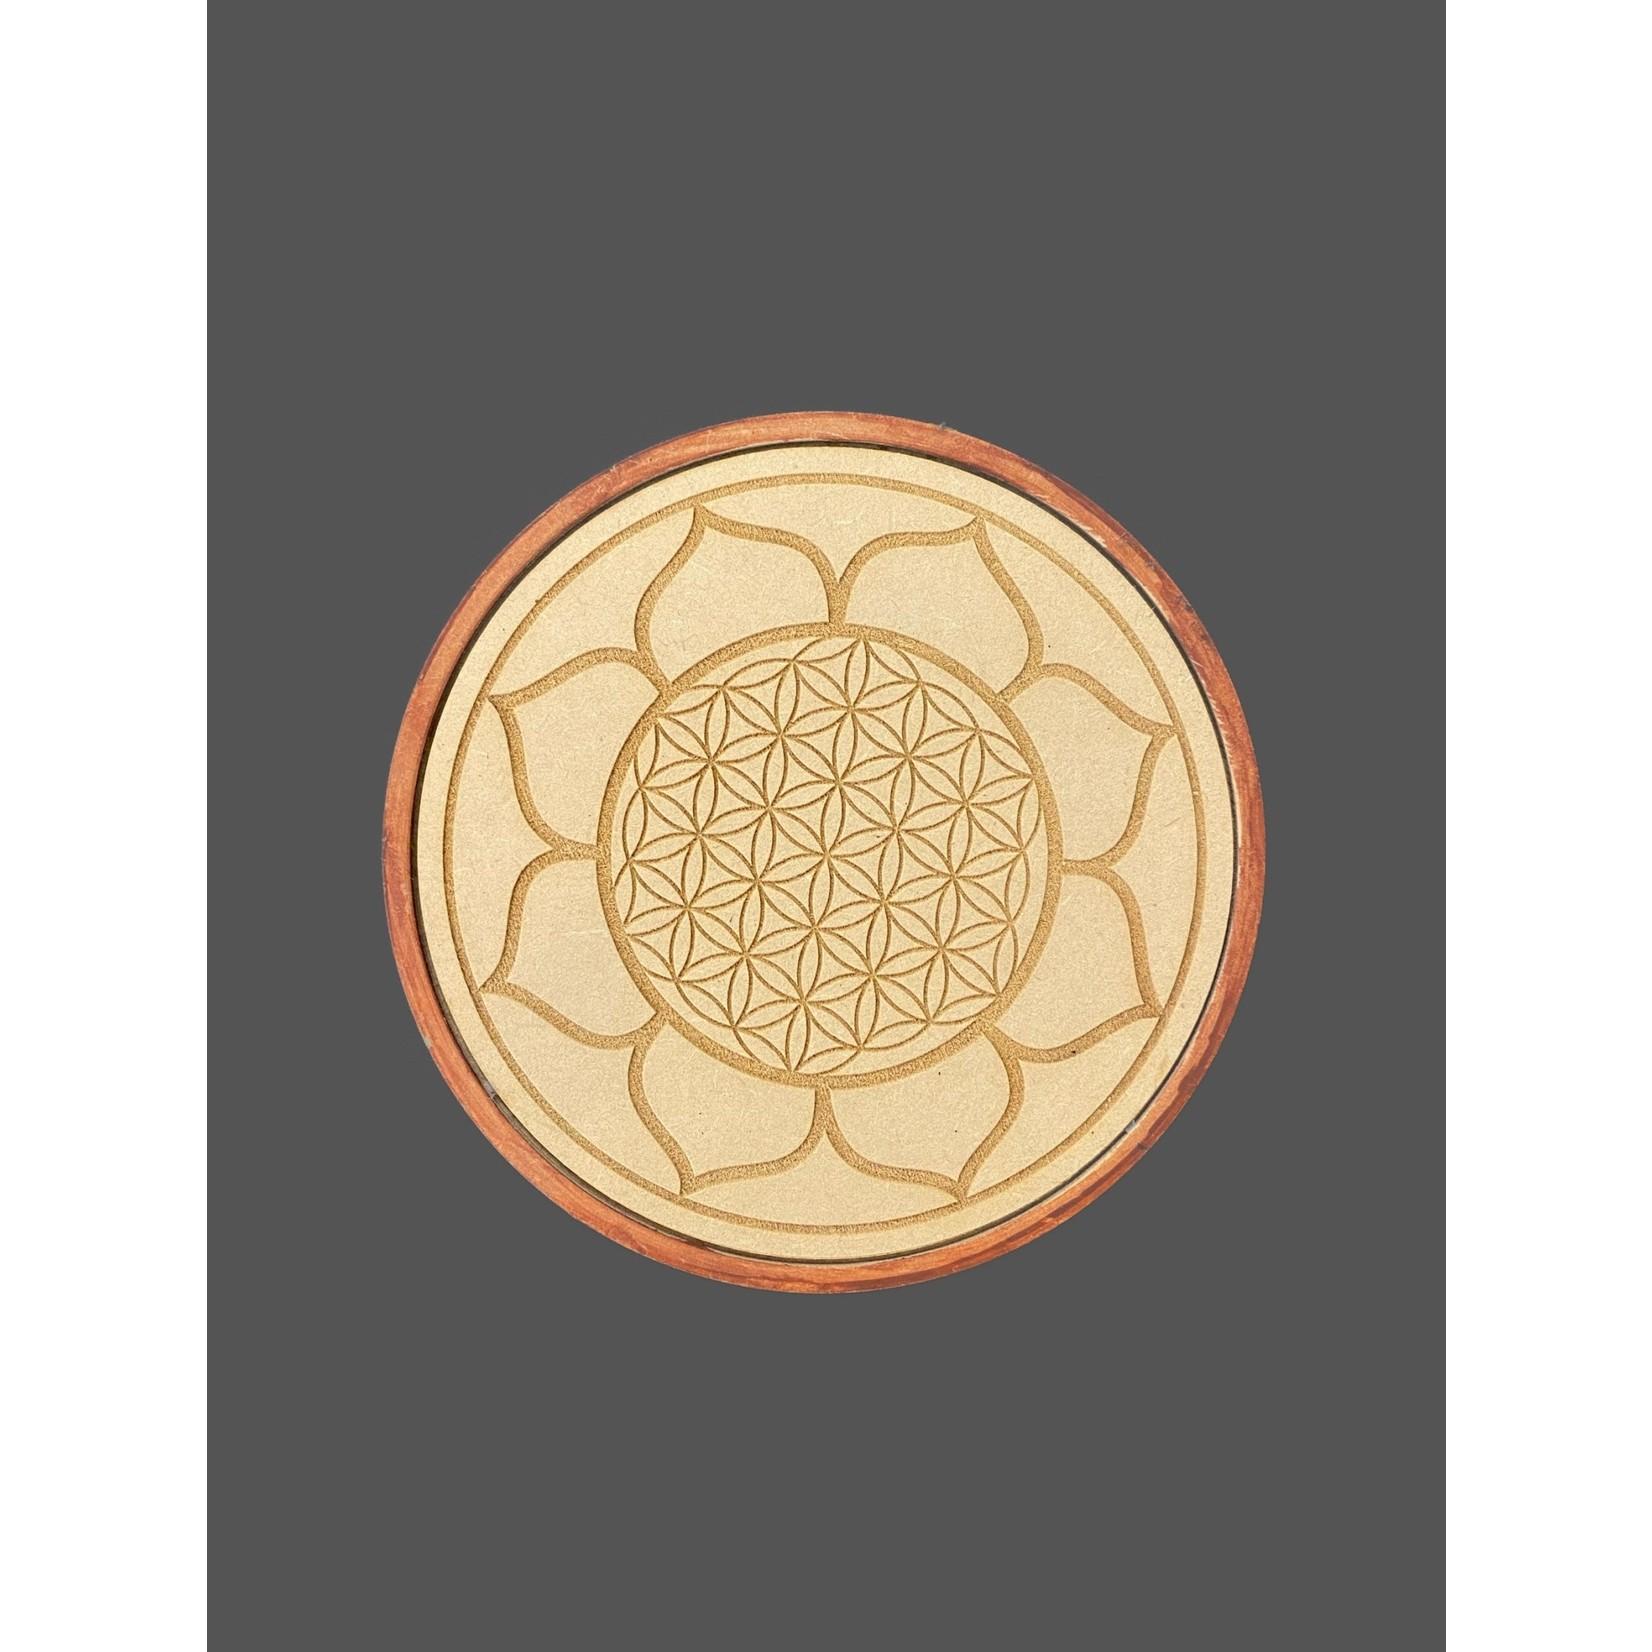 Cargador de Madera para Minerales. Flor de Loto